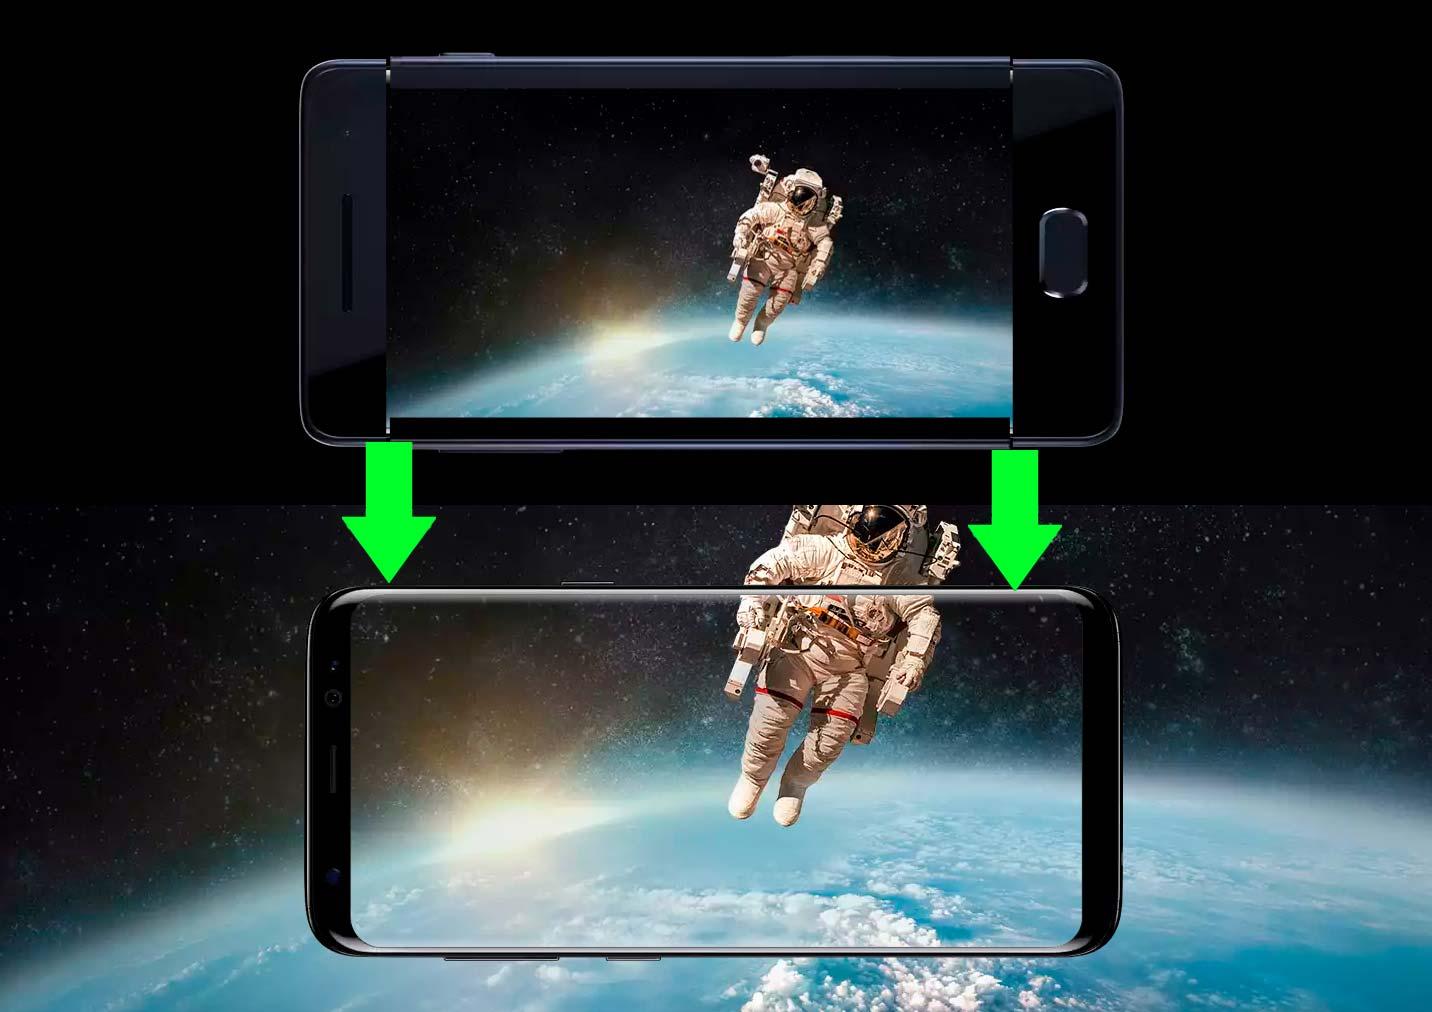 Samsung Galaxy s8 - безрамочный дизайн